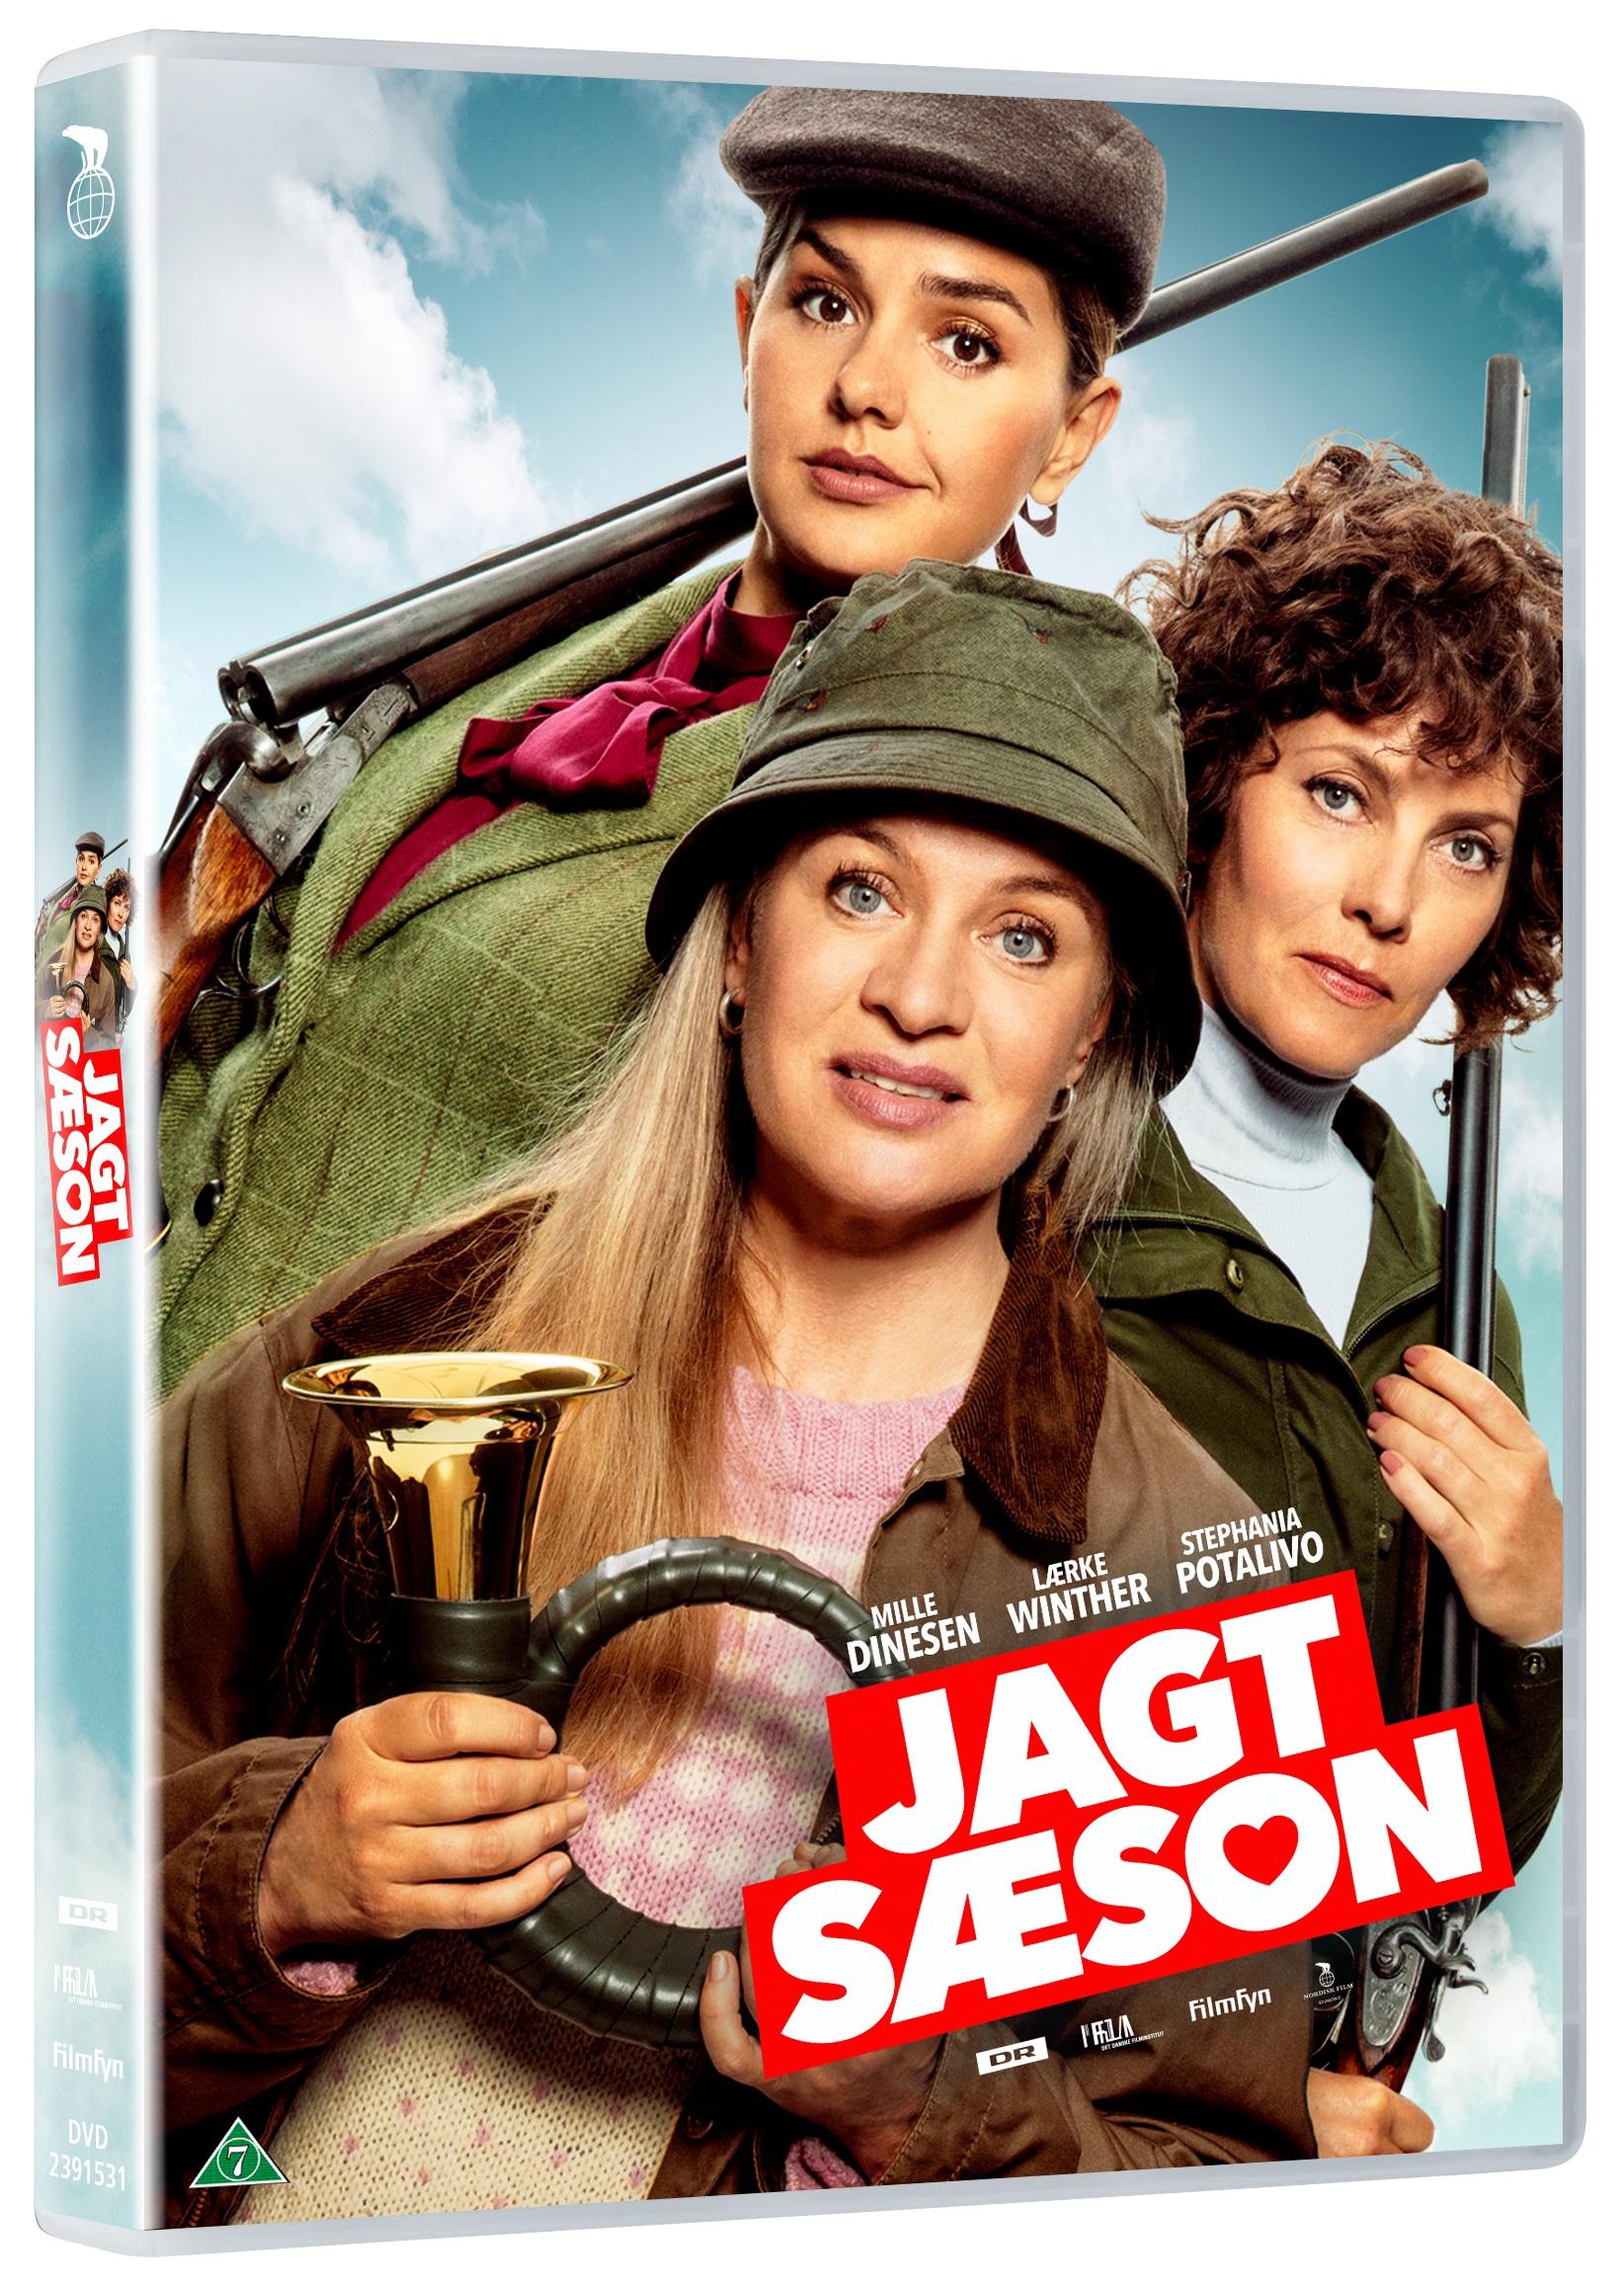 Jagtsæson -  - Film -  - 5708758724883 - 21/2-2020